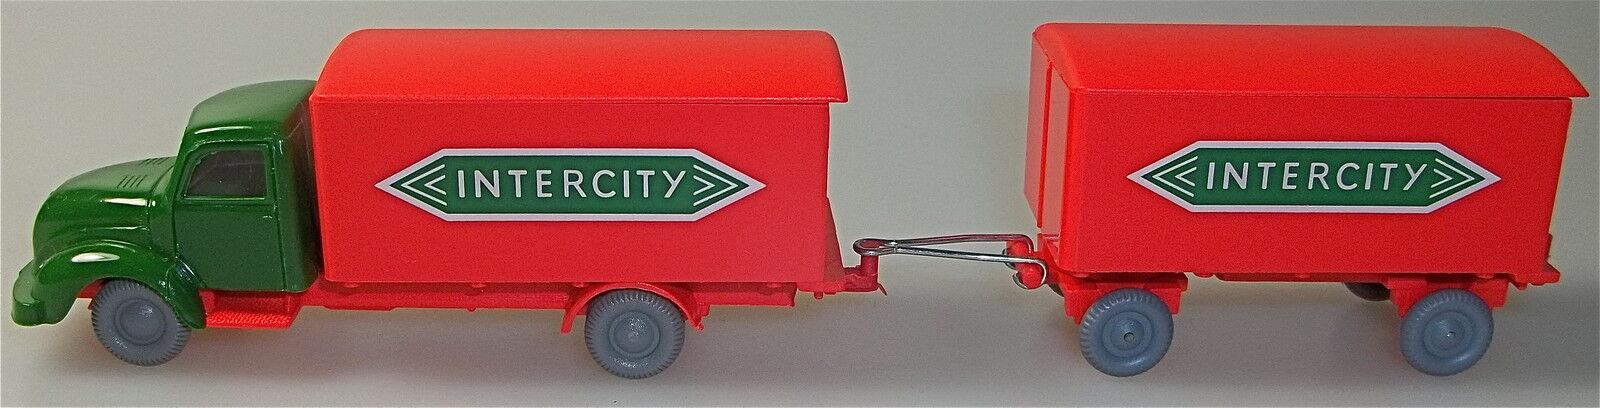 Intercity Magirus autour Hauber Hängerzug green red Imu H0 1 87 Å